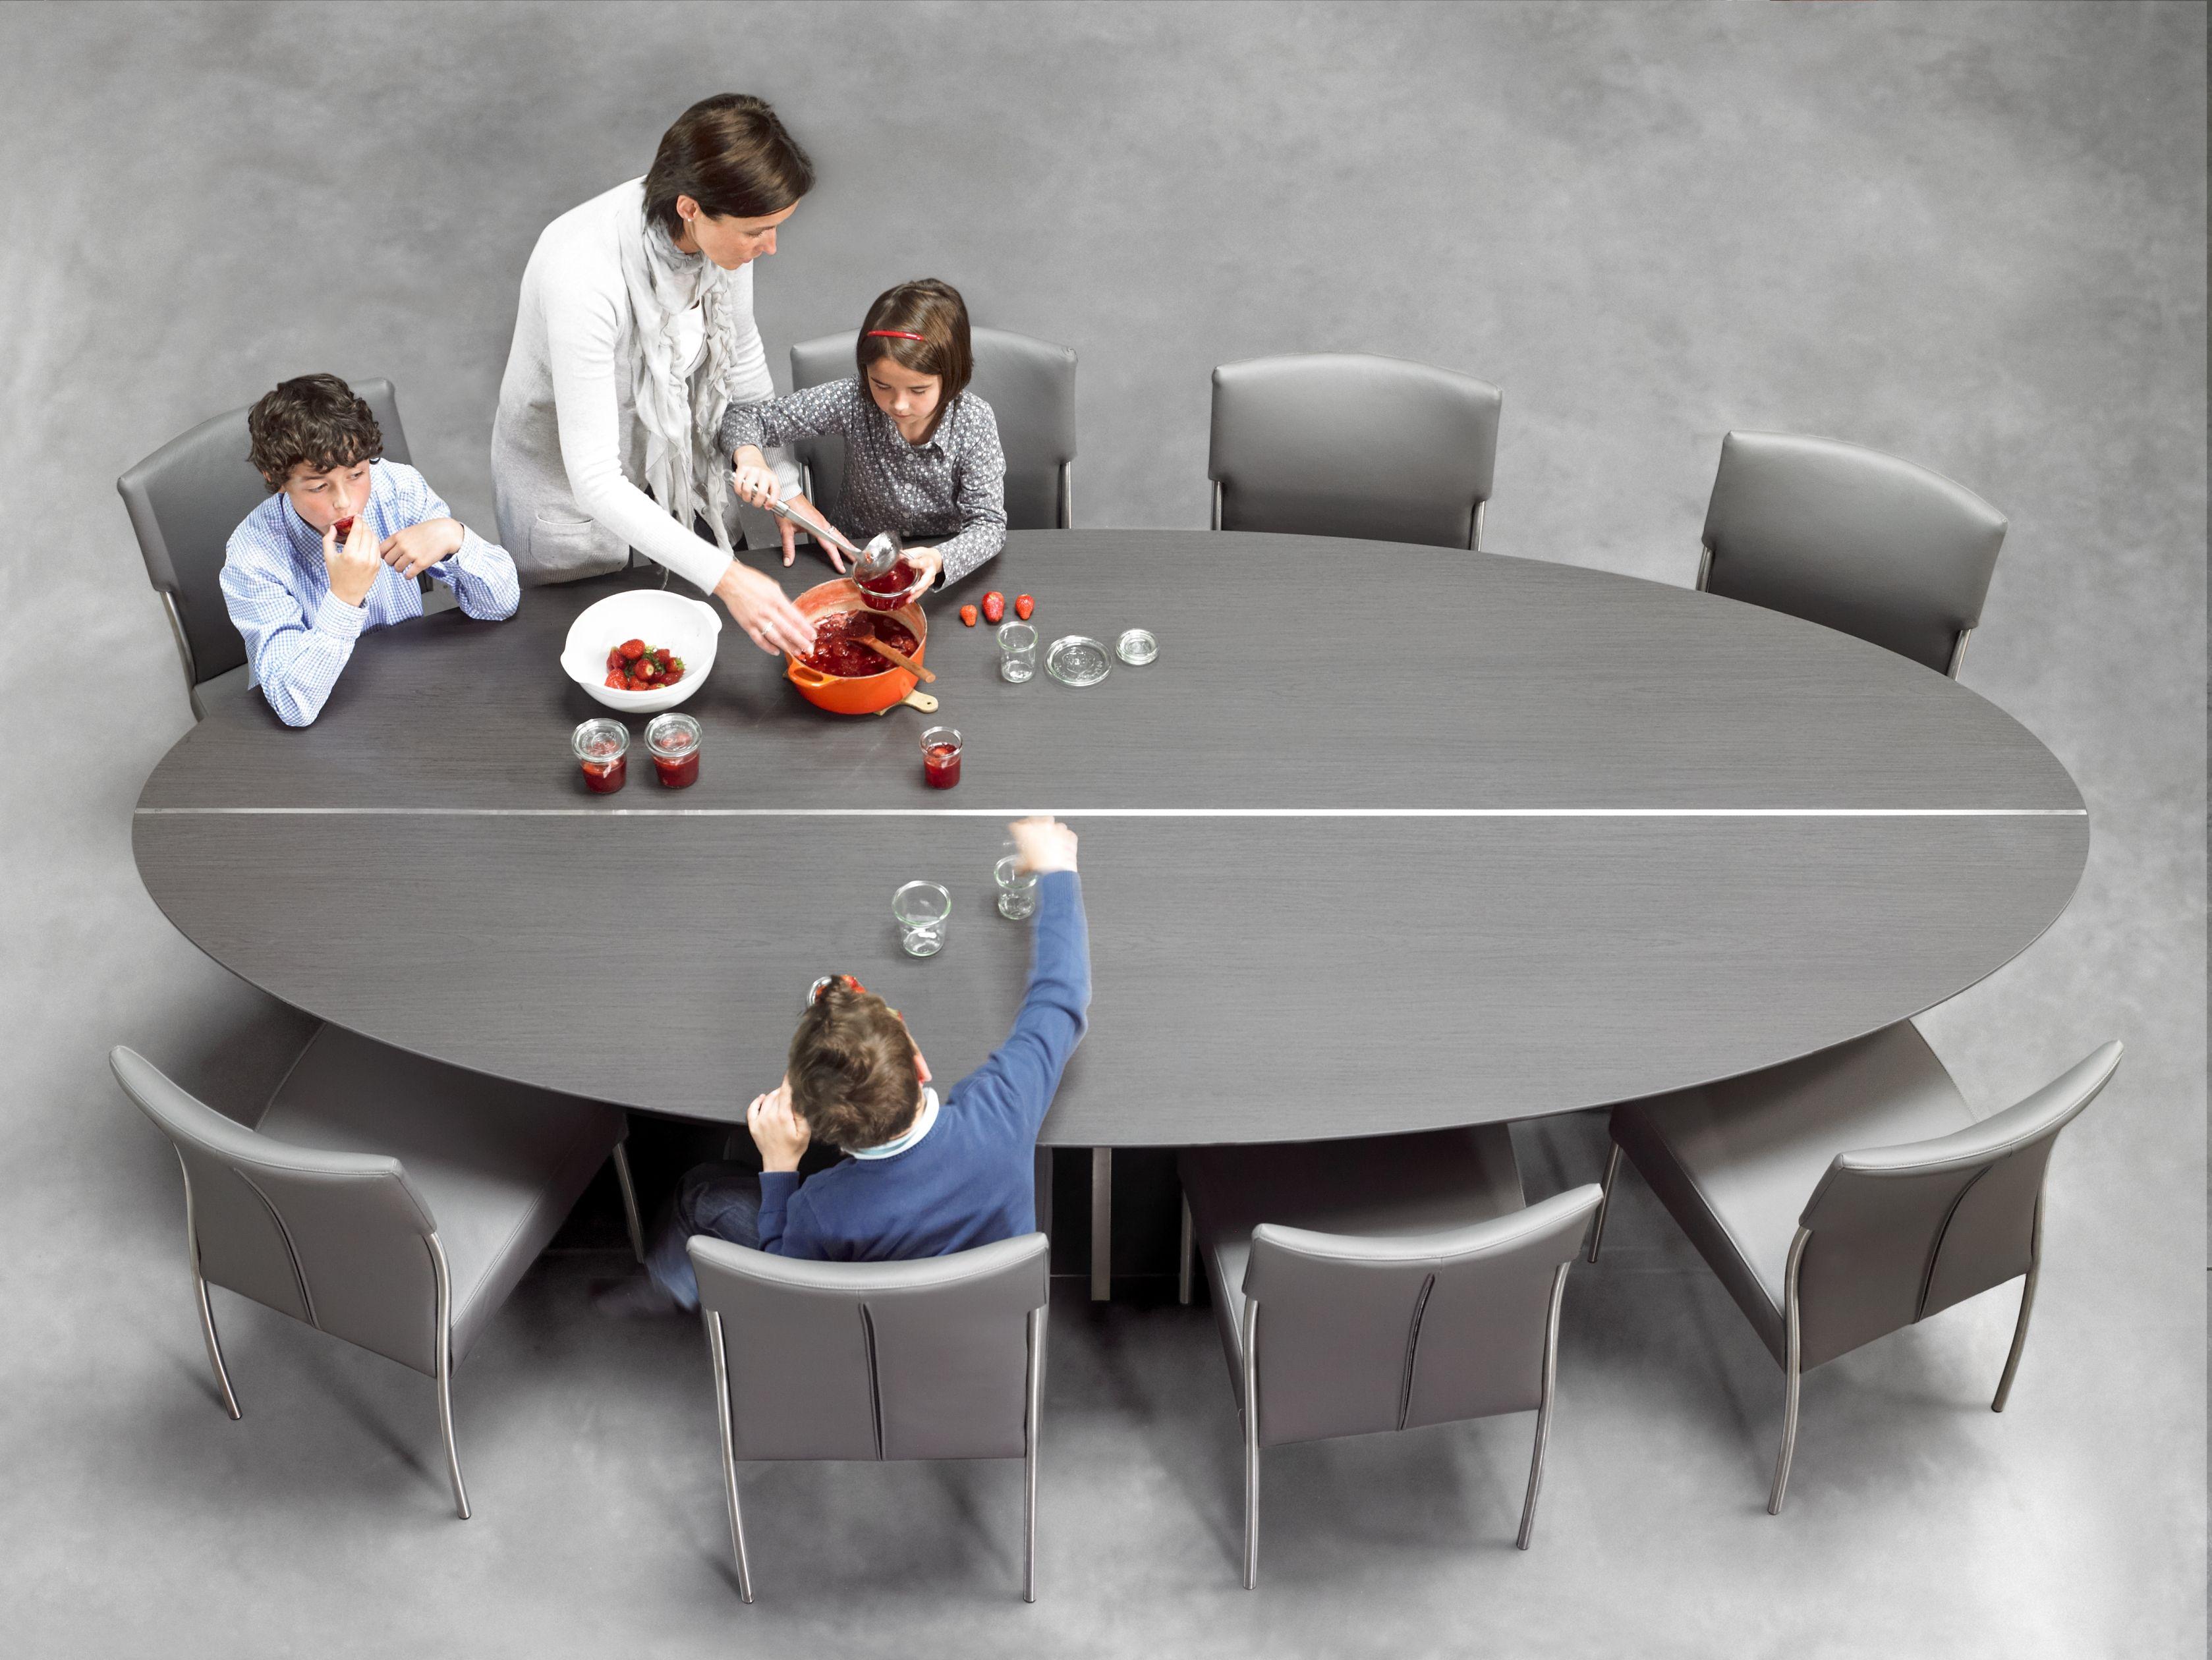 Table Ovale En Verre Salle Manger Table De Salle A Manger Design